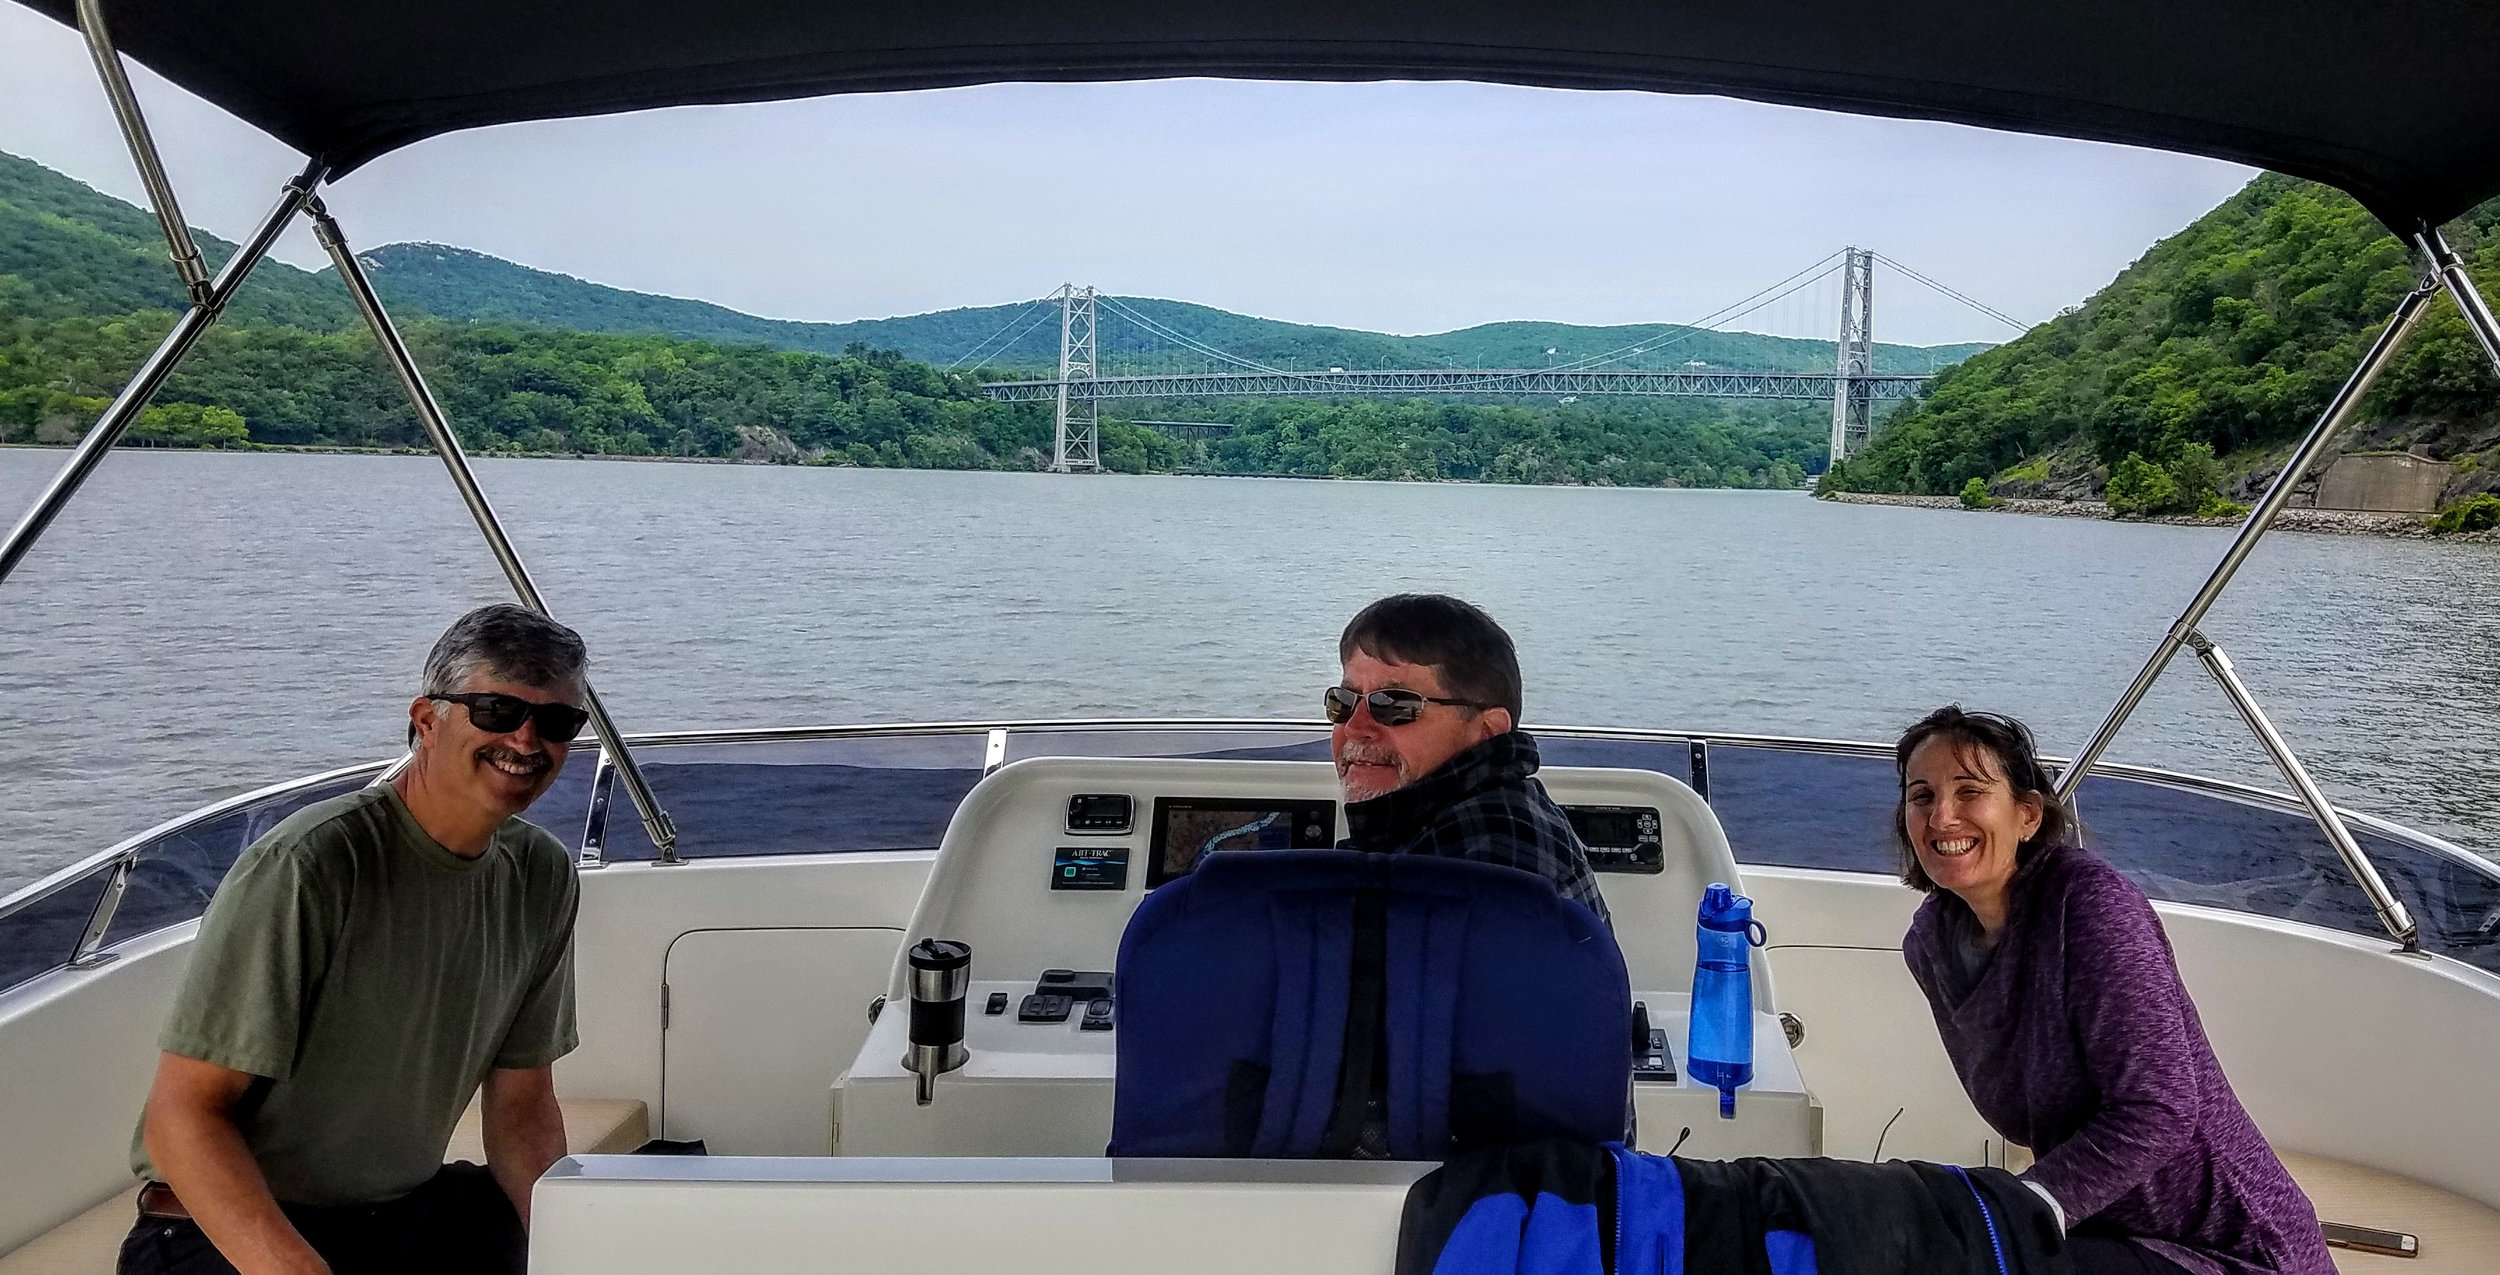 Heading north on the Hudson